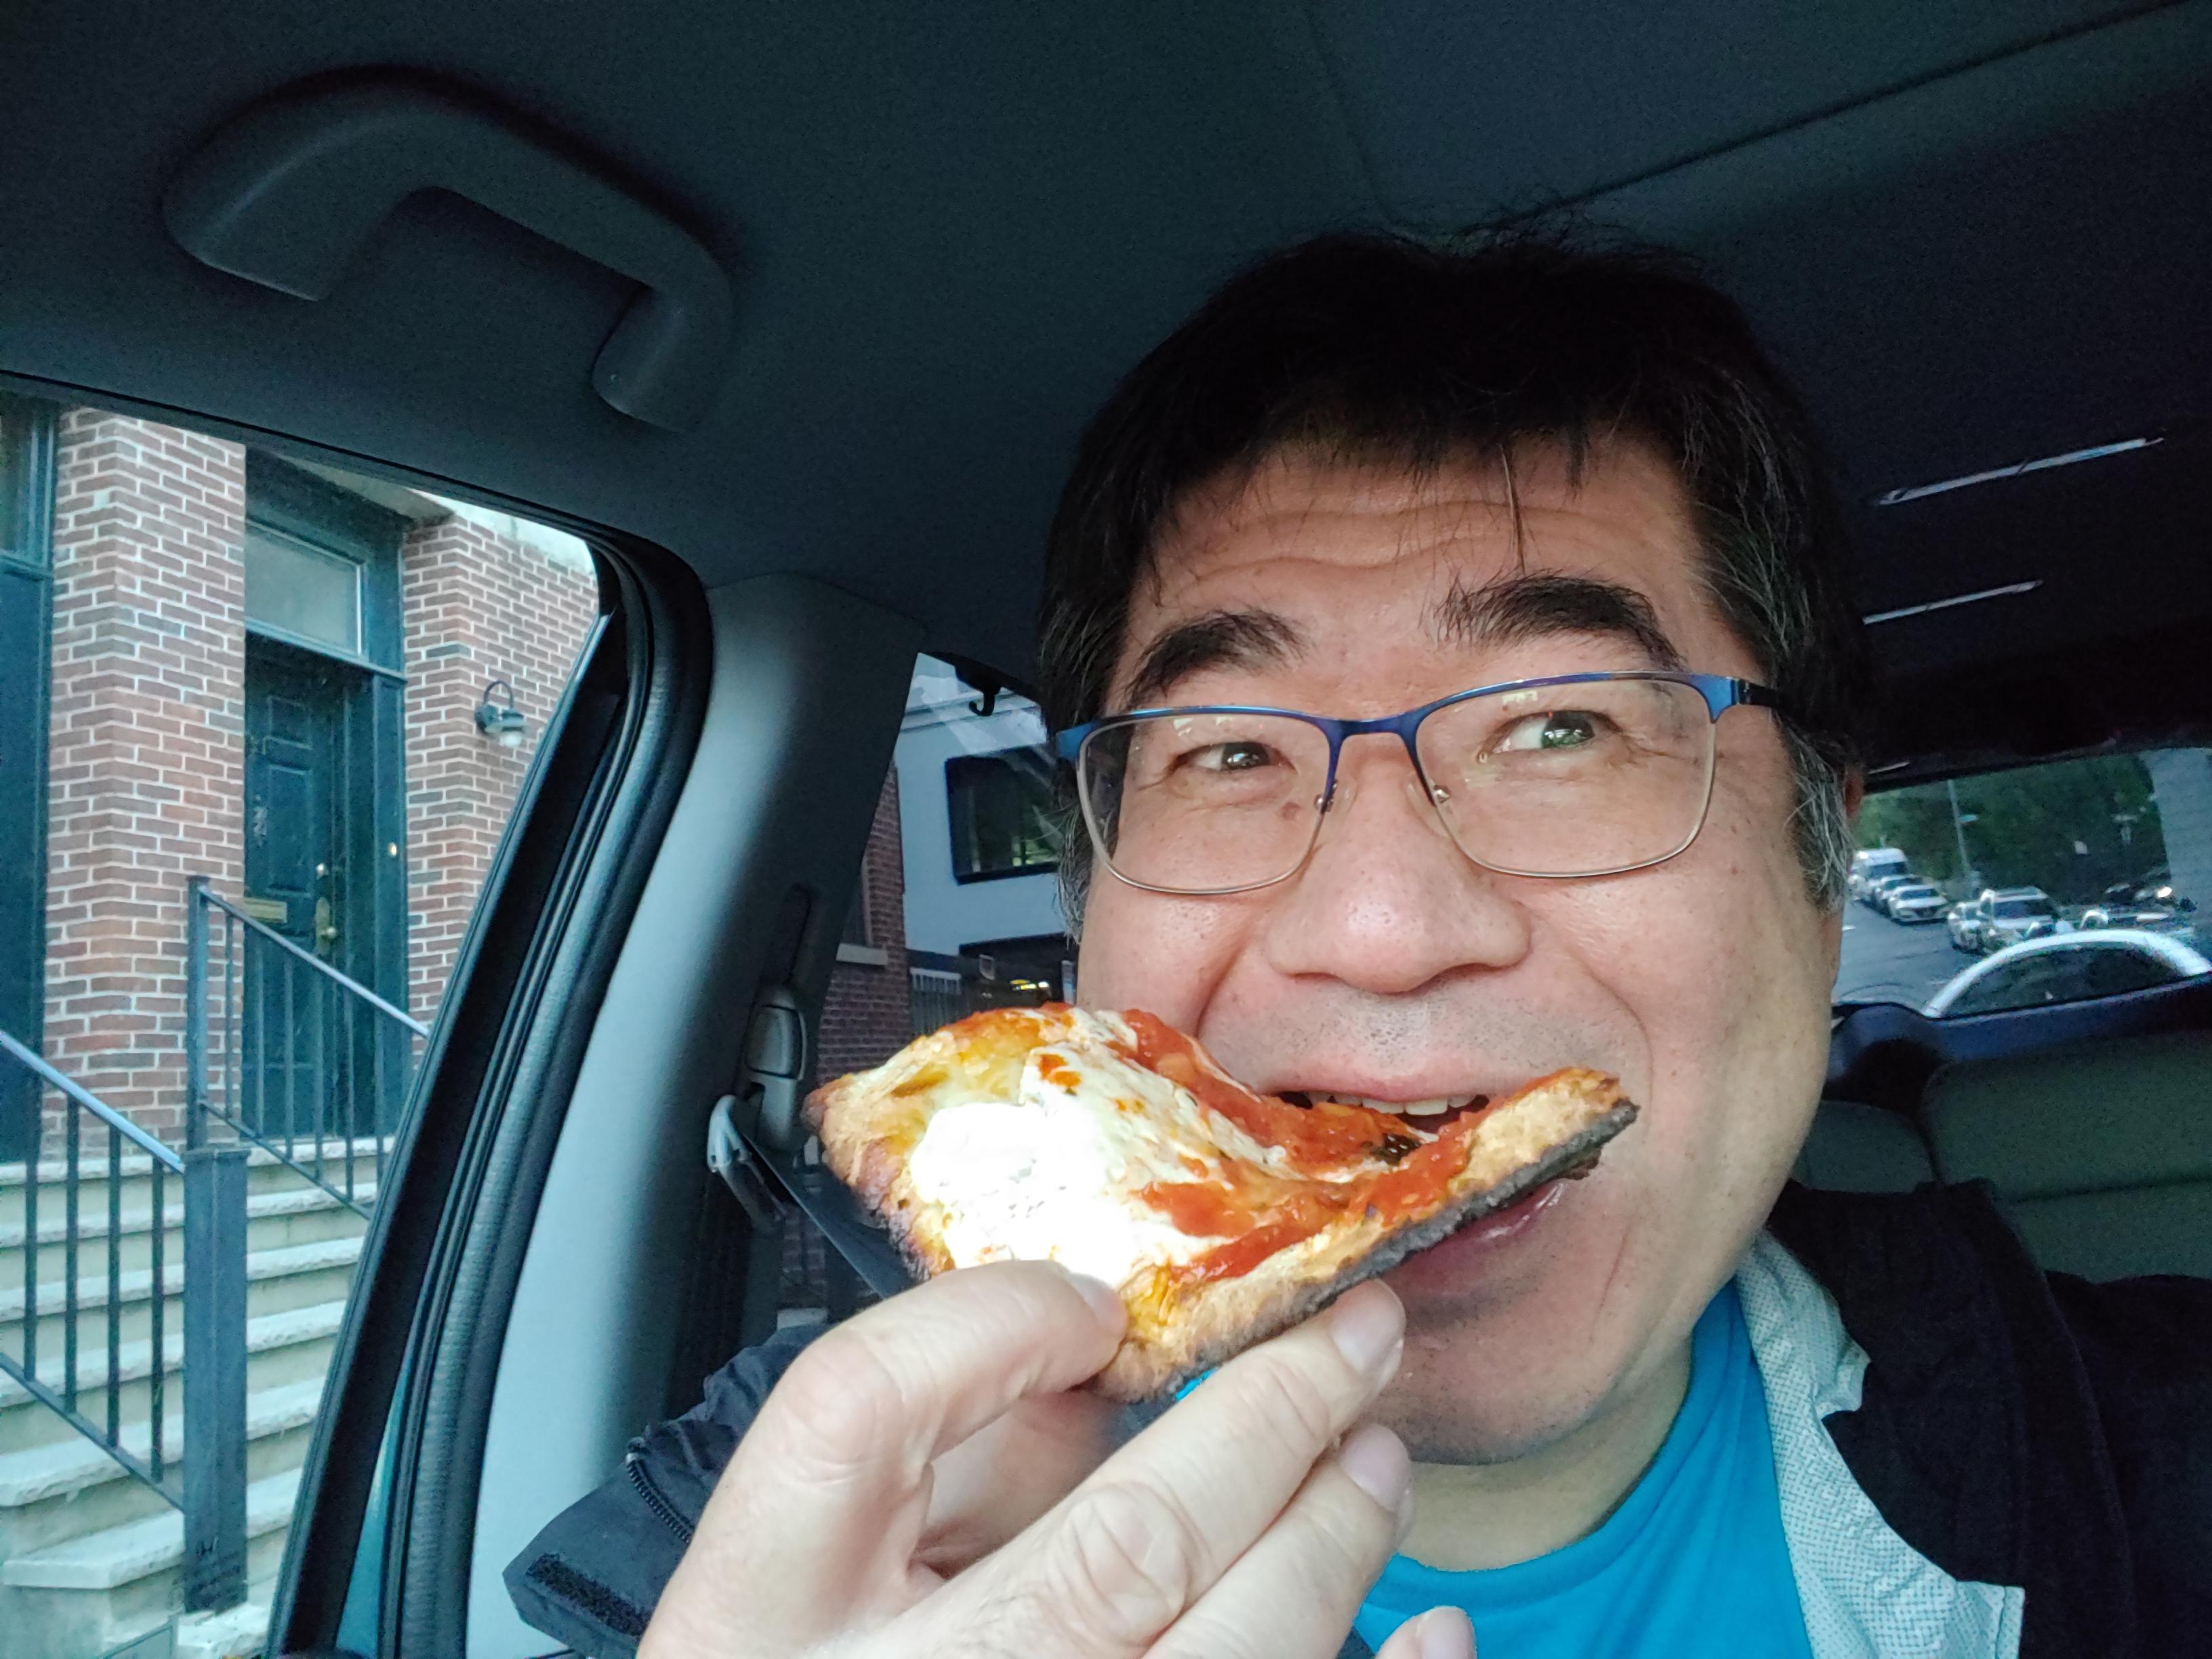 noah.lam on One Bite Pizza App